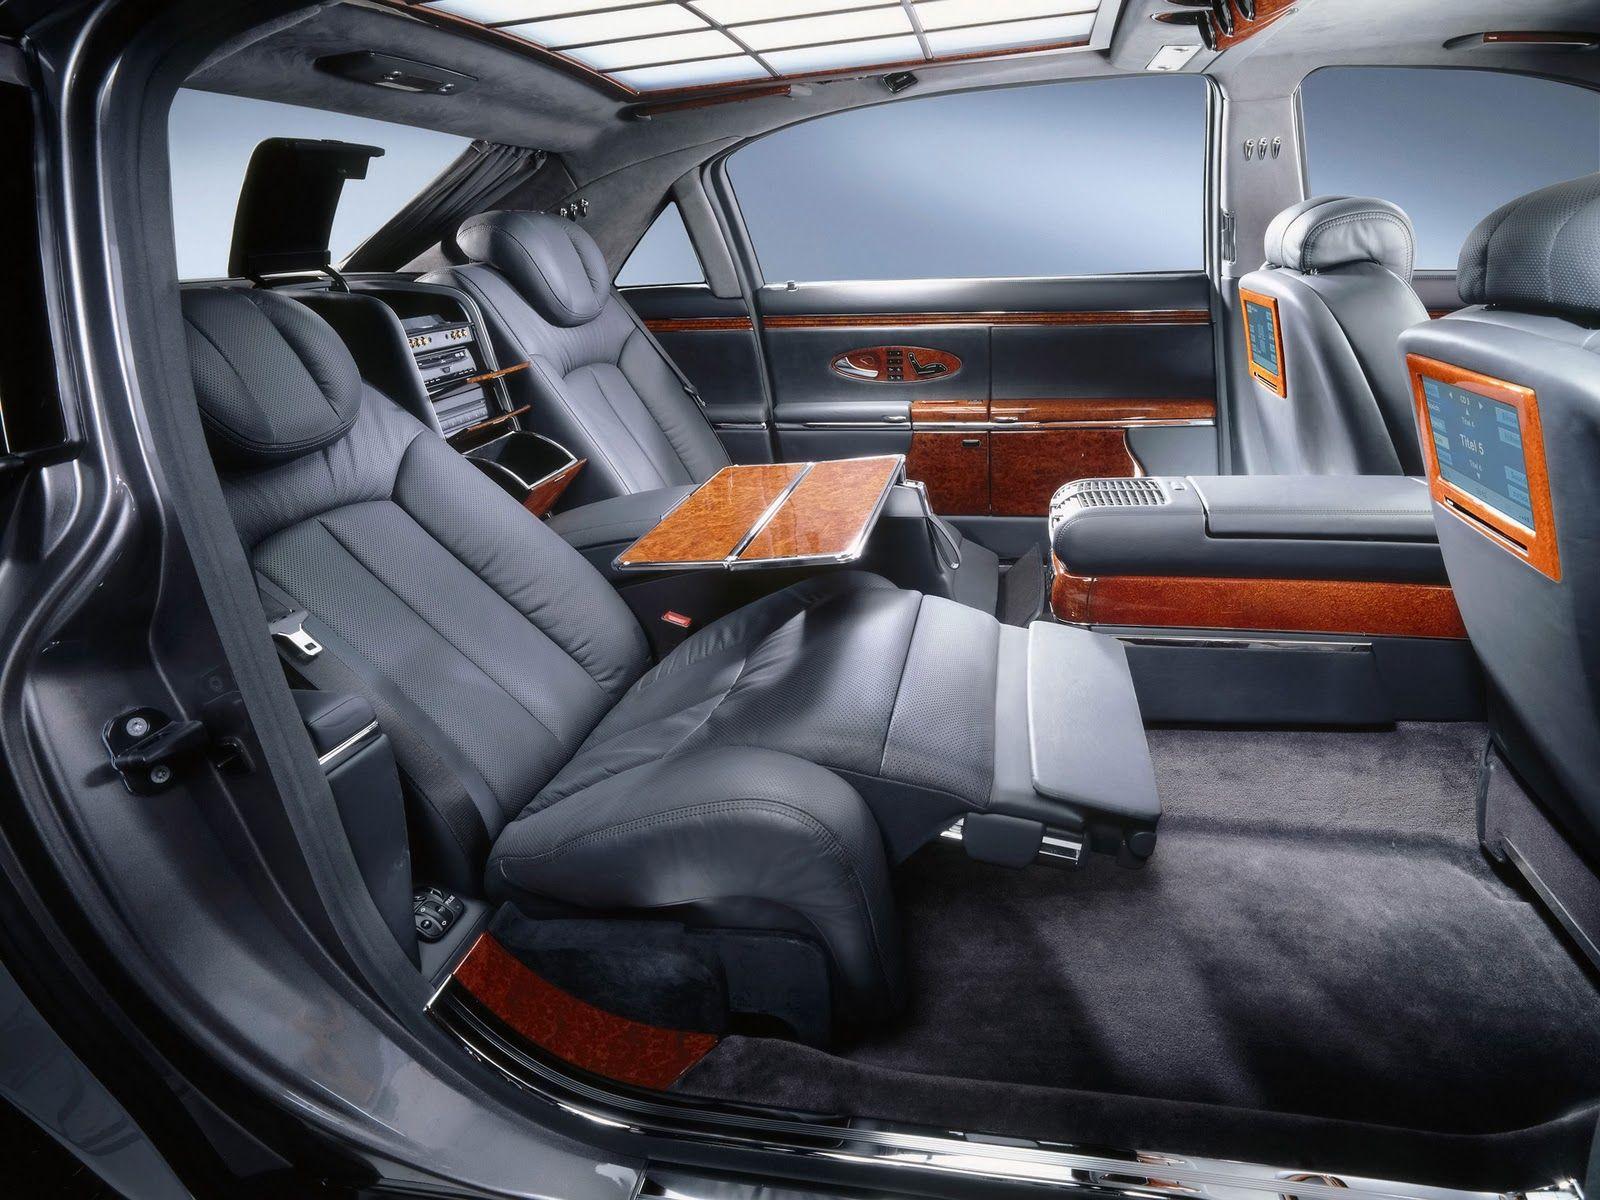 Exceptionnel Maybach Luxury Car Interior   Bing Images | Cars | Pinterest | Car  Interiors, Luxury Cars And Maybach